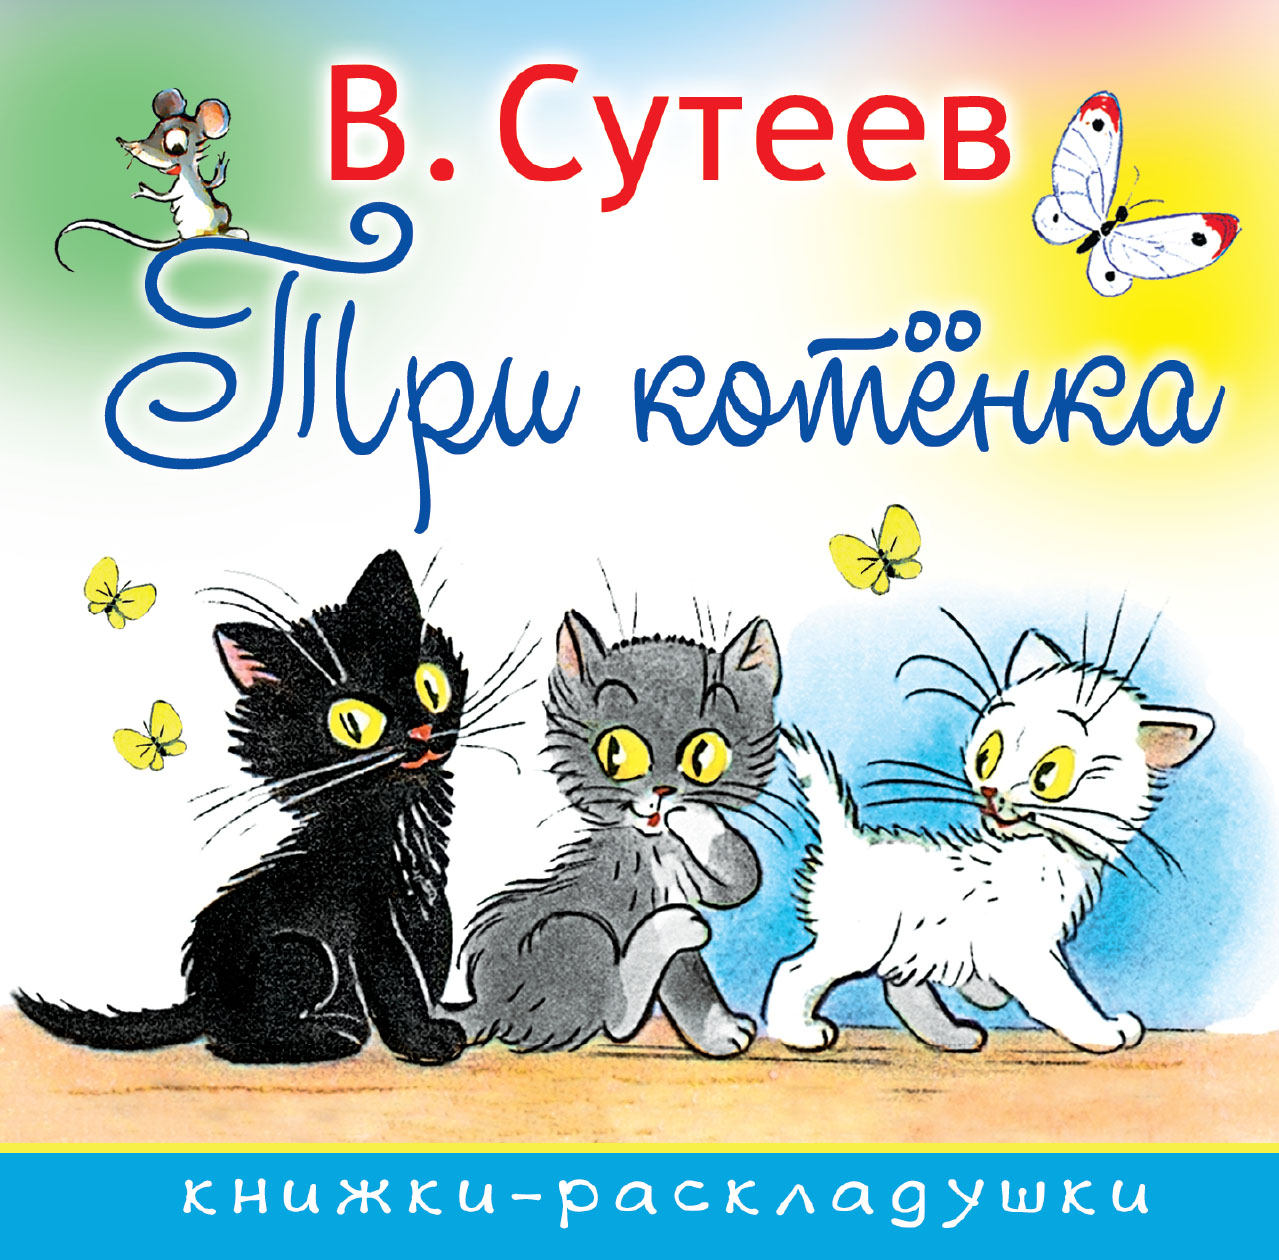 В. Сутеев Три котенка сутеев владимир григорьевич три котёнка isbn 978 5 17 100500 9